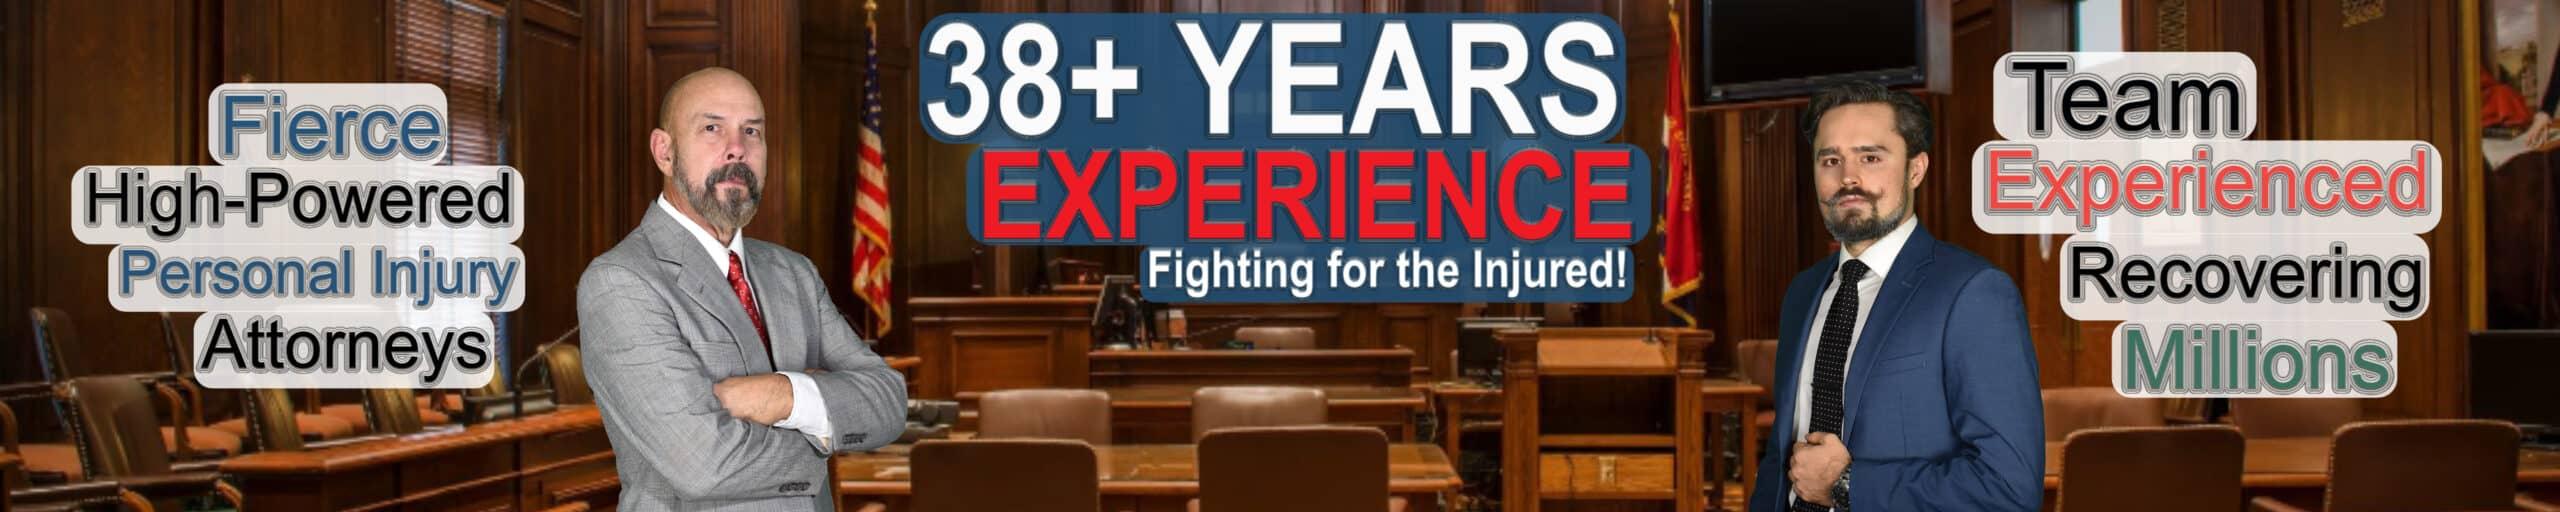 Atlanta-Georgia-Damages-Personal-Injury-Attorney-Lawyer-Hurt-Injured-Damages-Hospital-Car-Accident-Broken-Best-Merck-Law